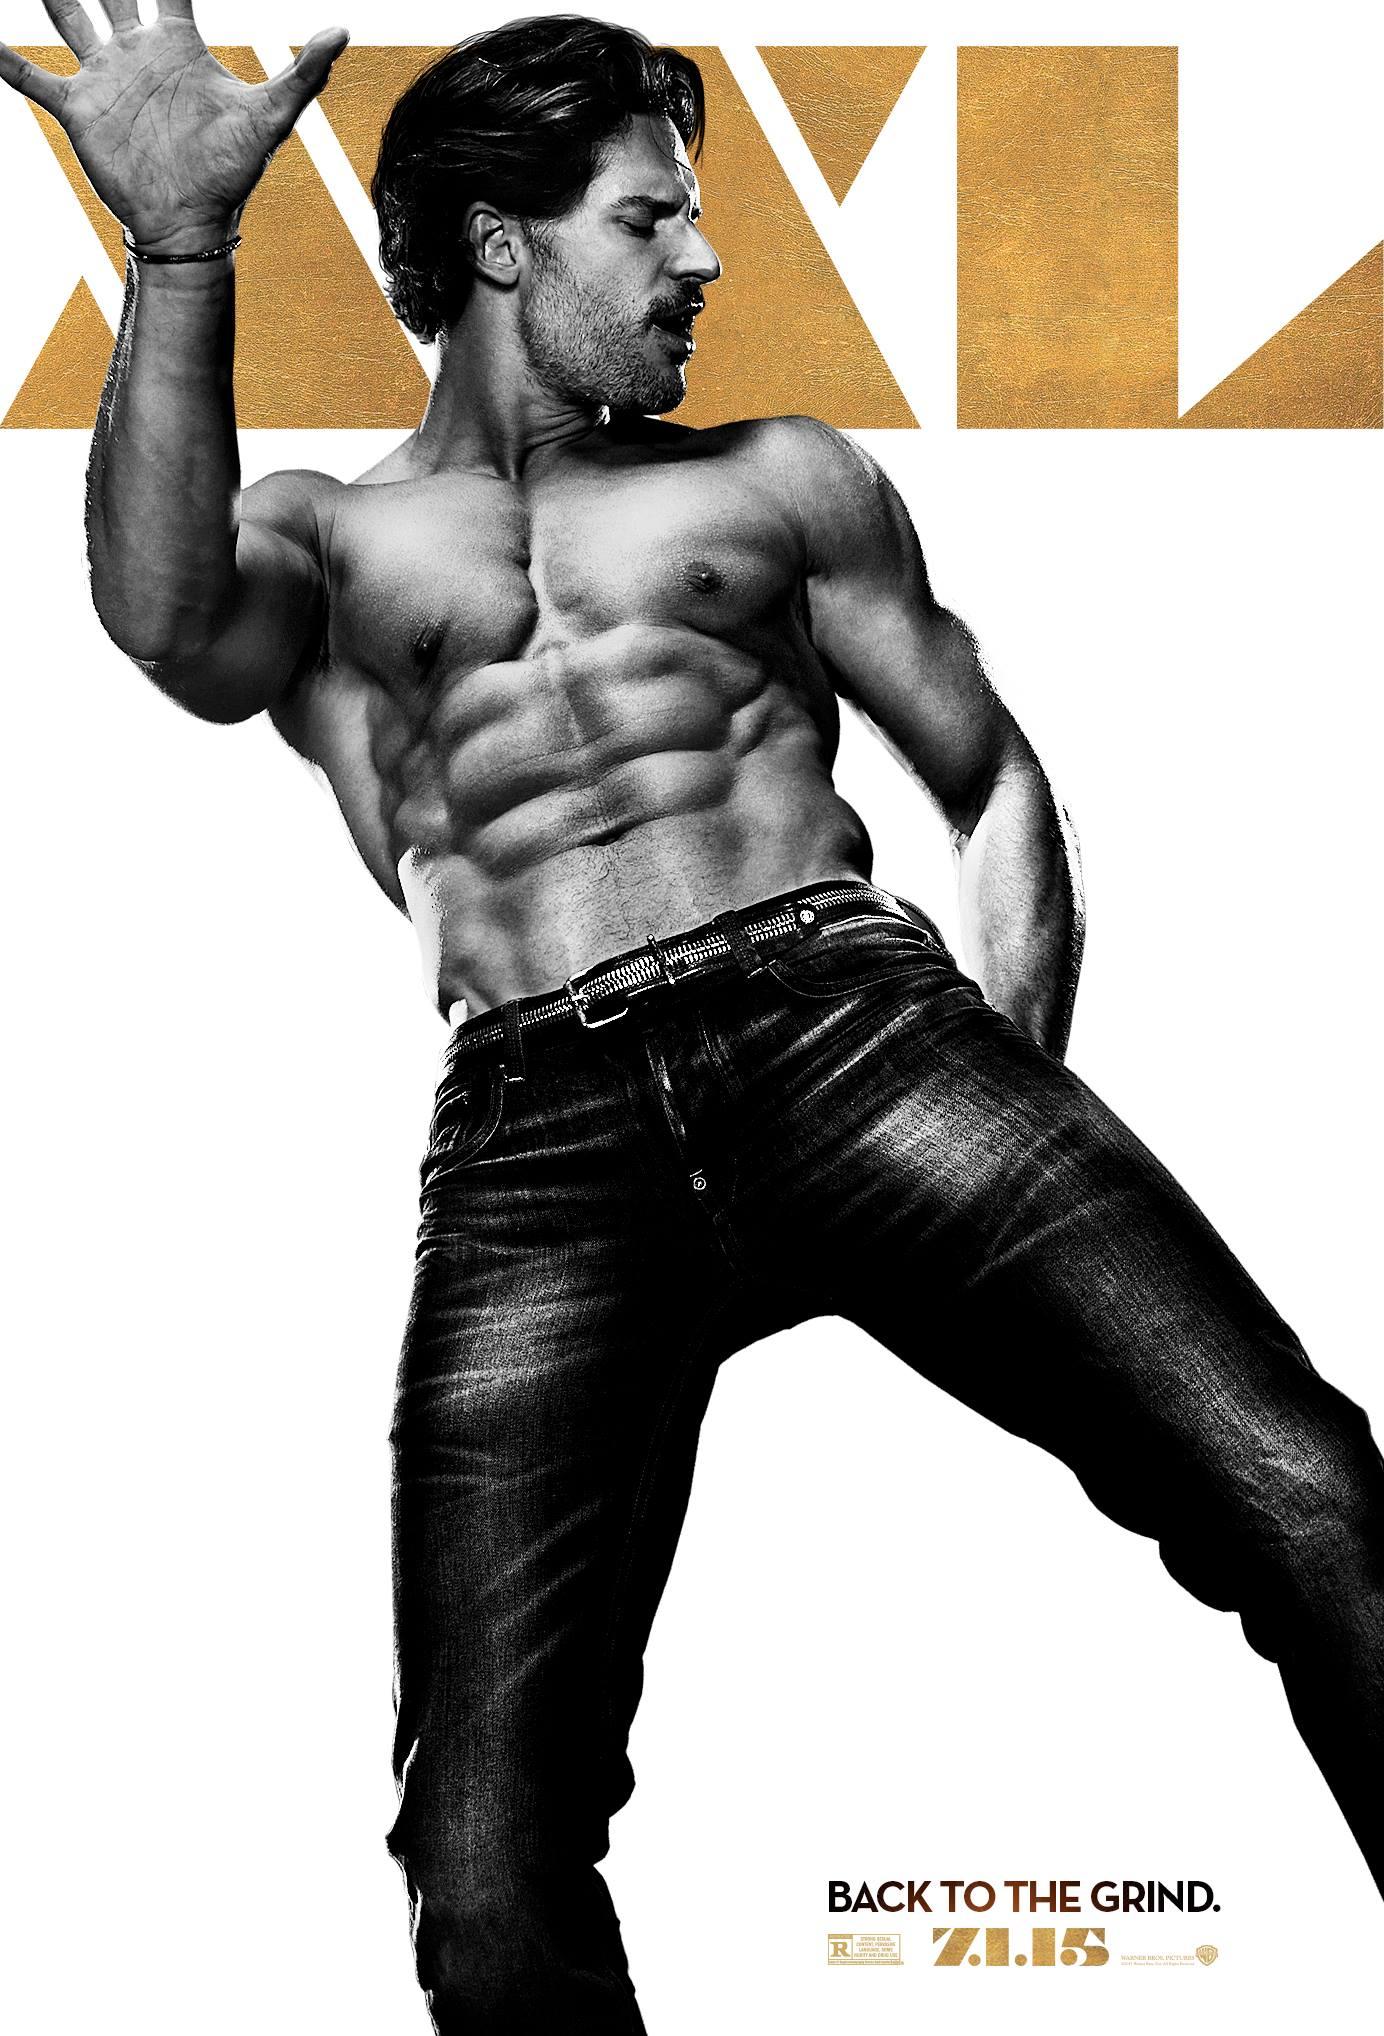 Joe Manganiello & Kevin Nash 'Magic Mike XXL' Posters Revealed